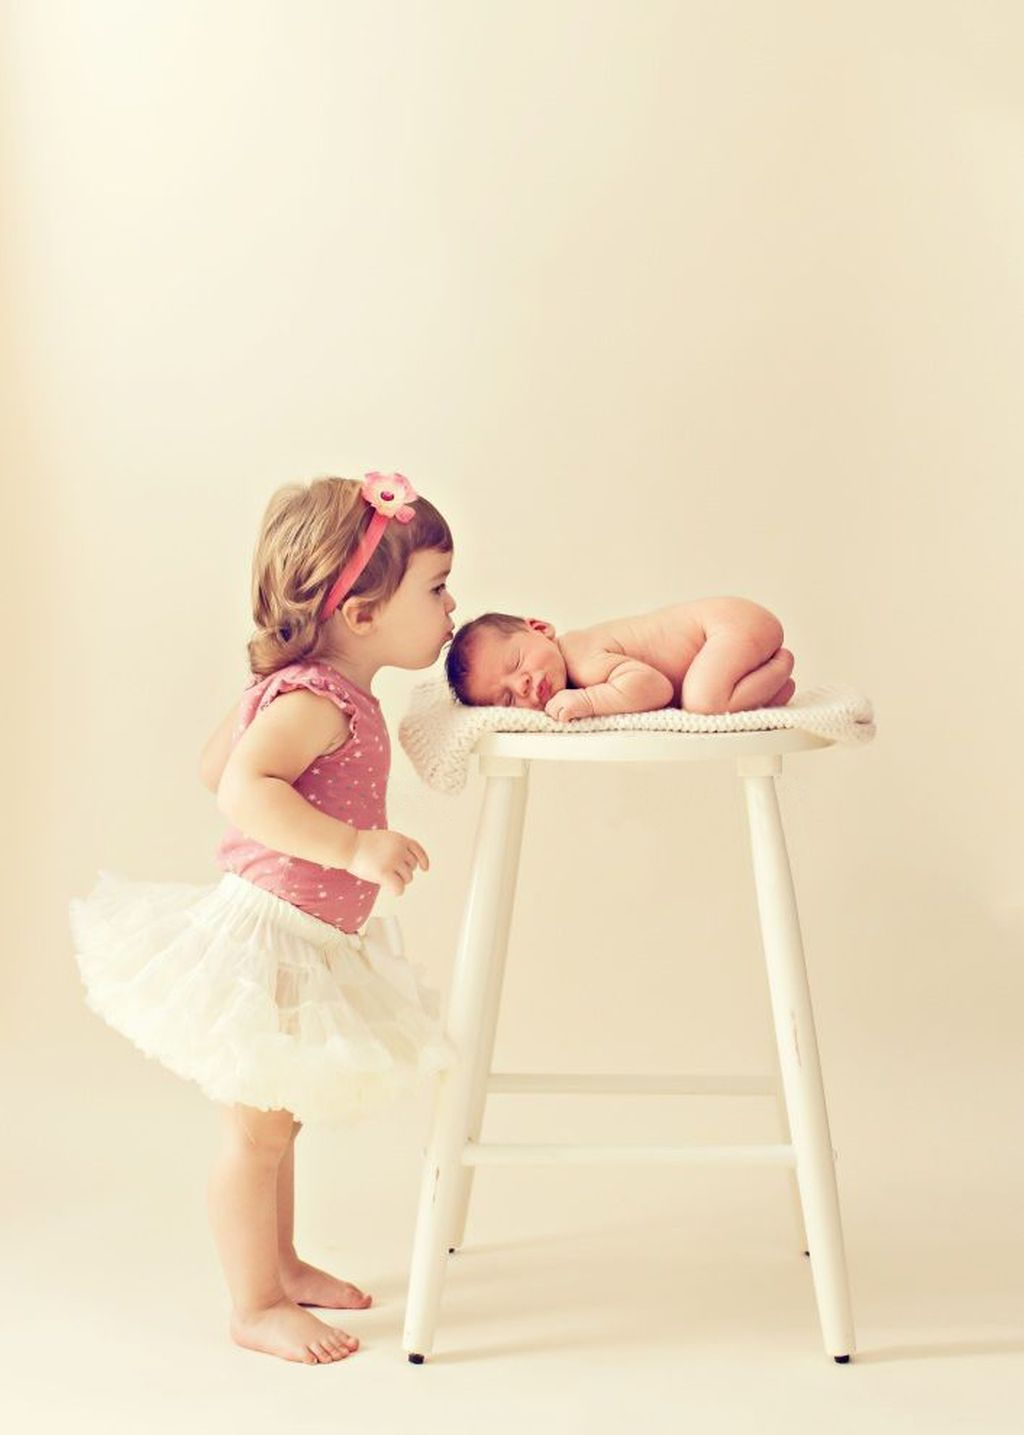 da67e9ce40d Τι να προσέξετε, όταν επισκέπτεστε ένα νεογέννητο | imommy.gr